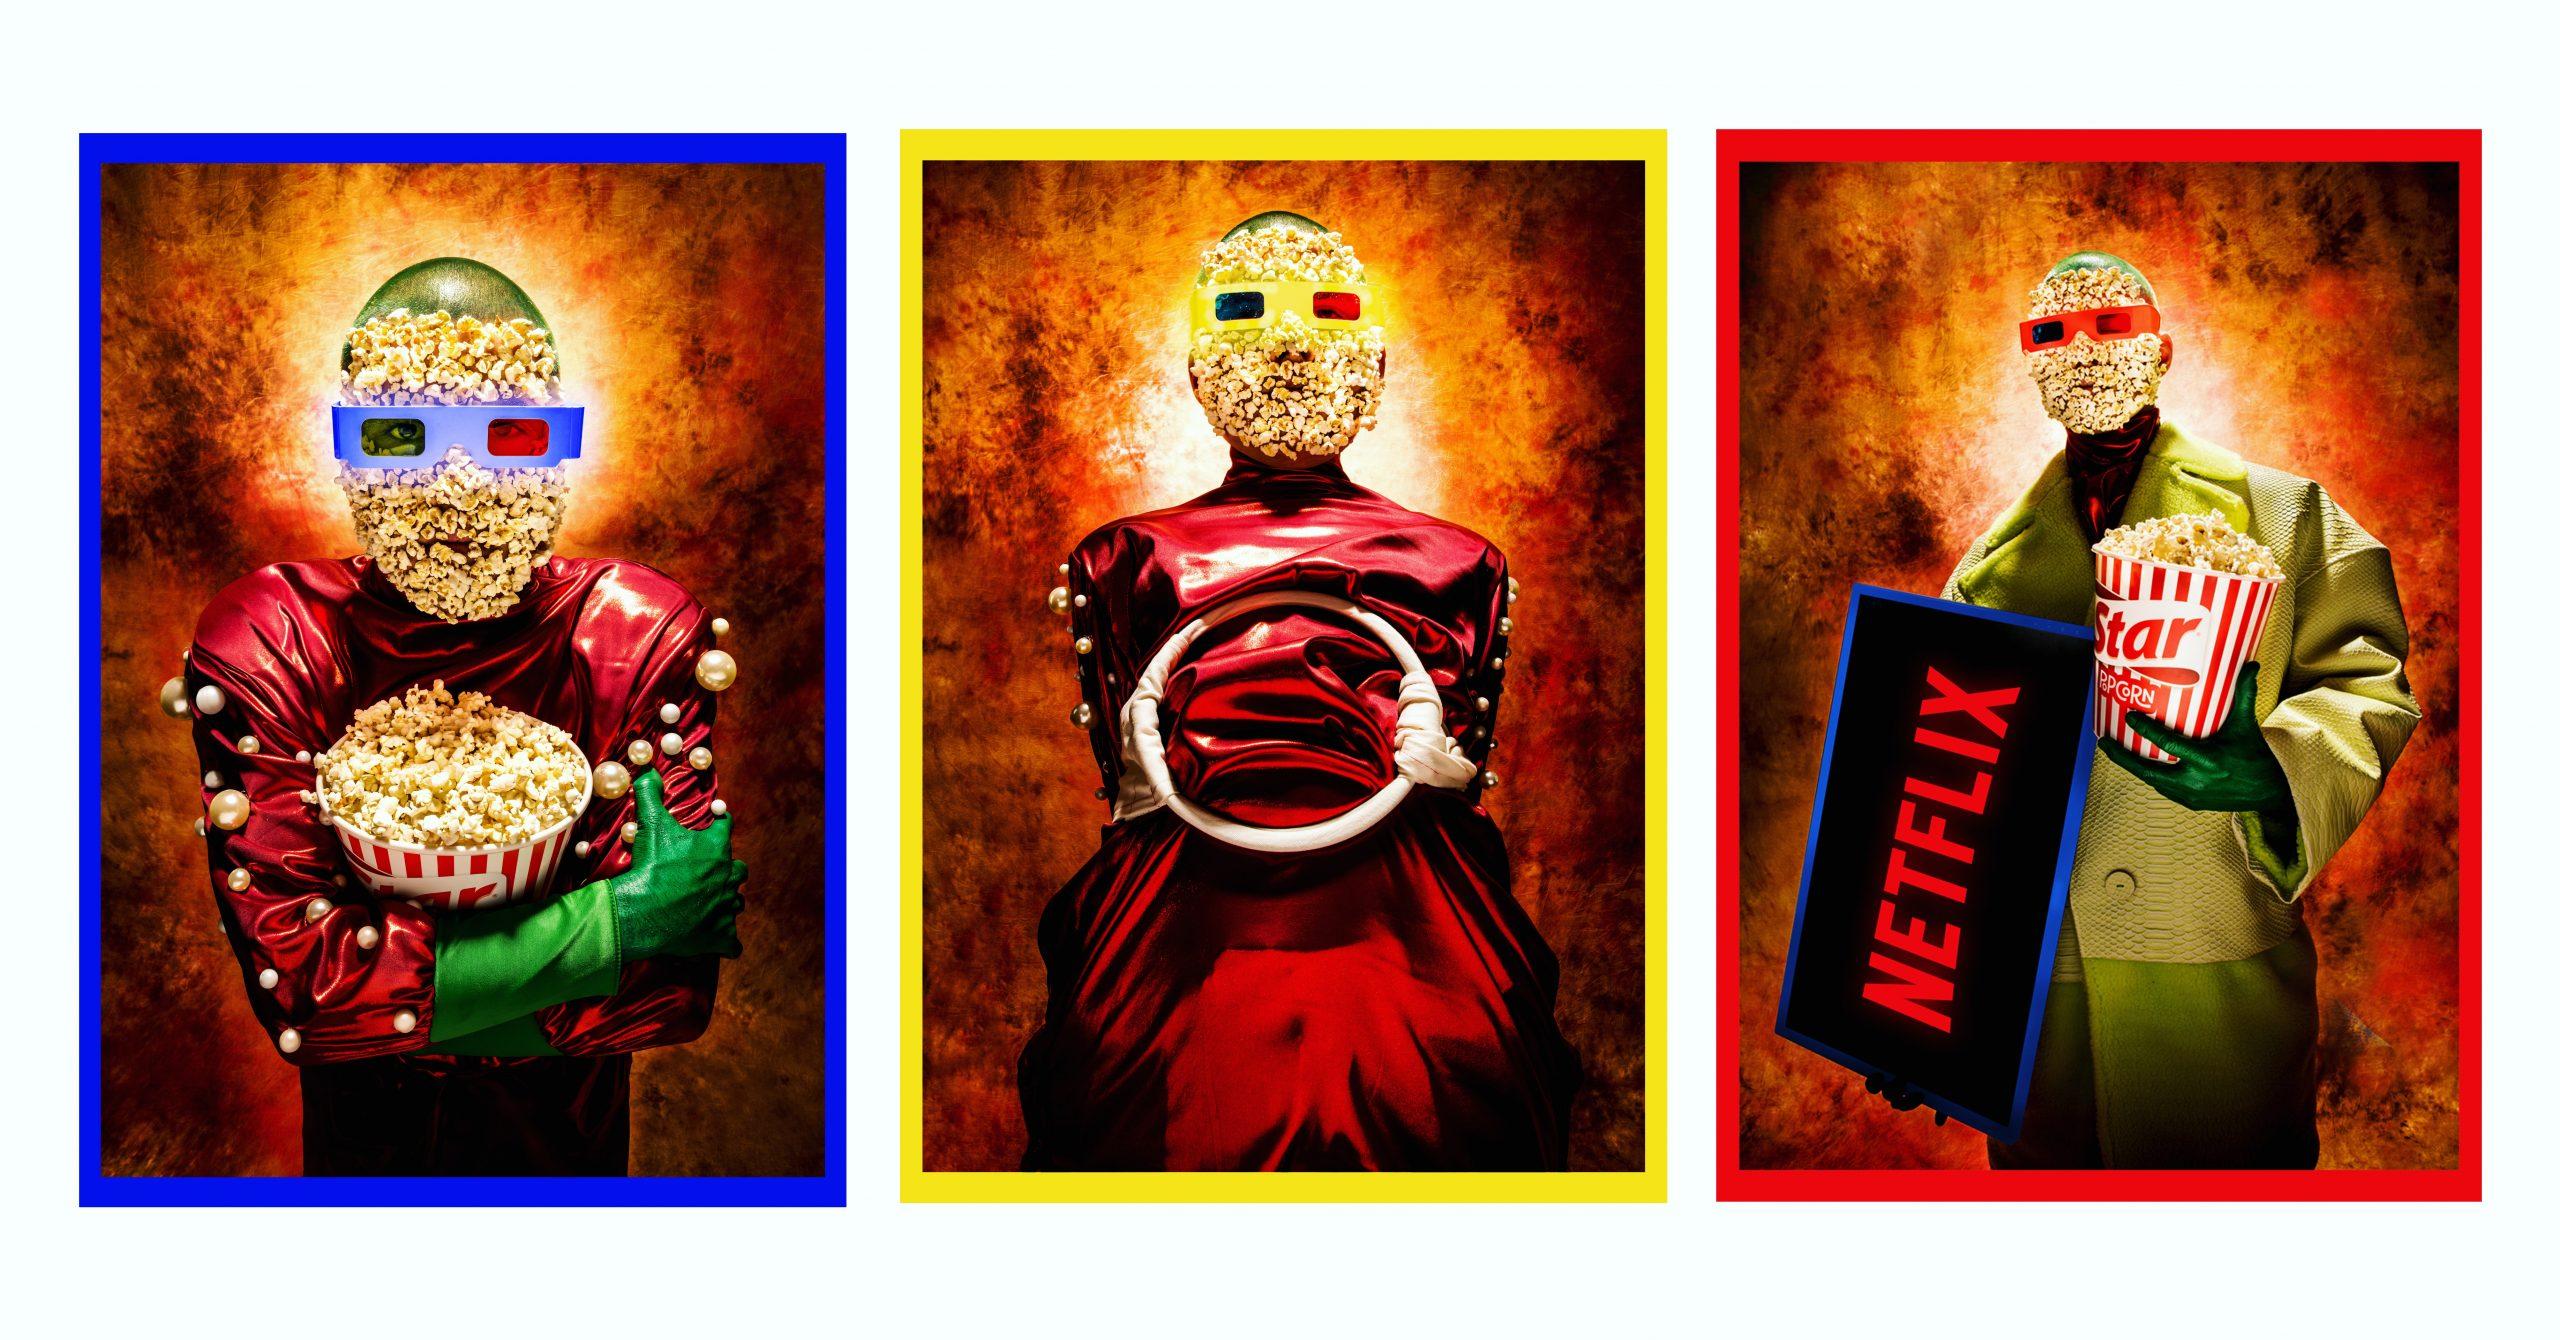 Art - The arts